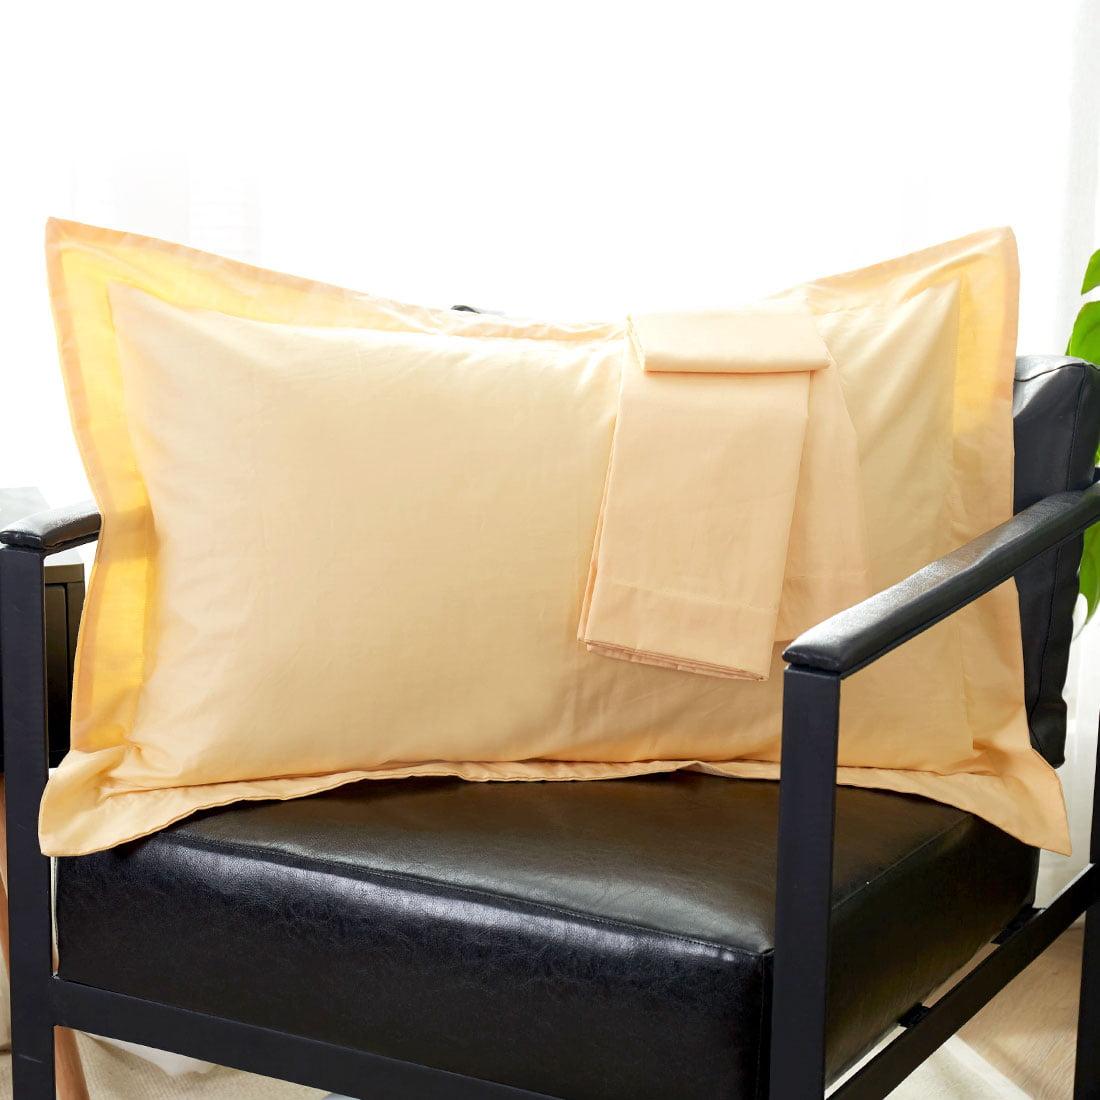 Pillow Shams Oxford Pillow Cases Pillowcase 300 TC Egyptian Cotton Set of 2,Queen,King,Standard